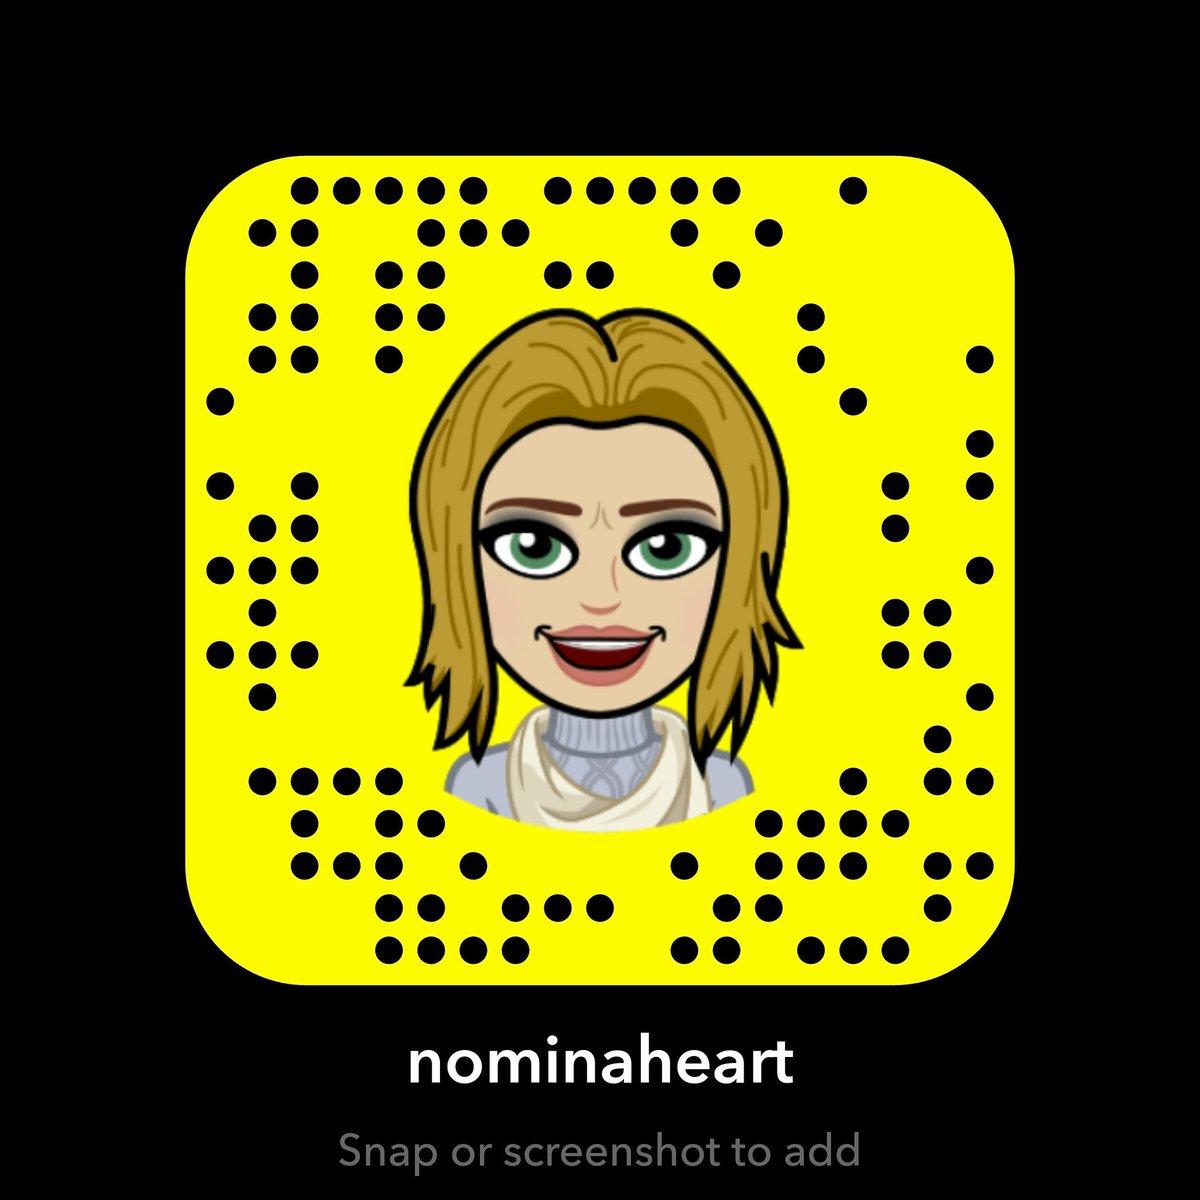 Naughty snapchats to add